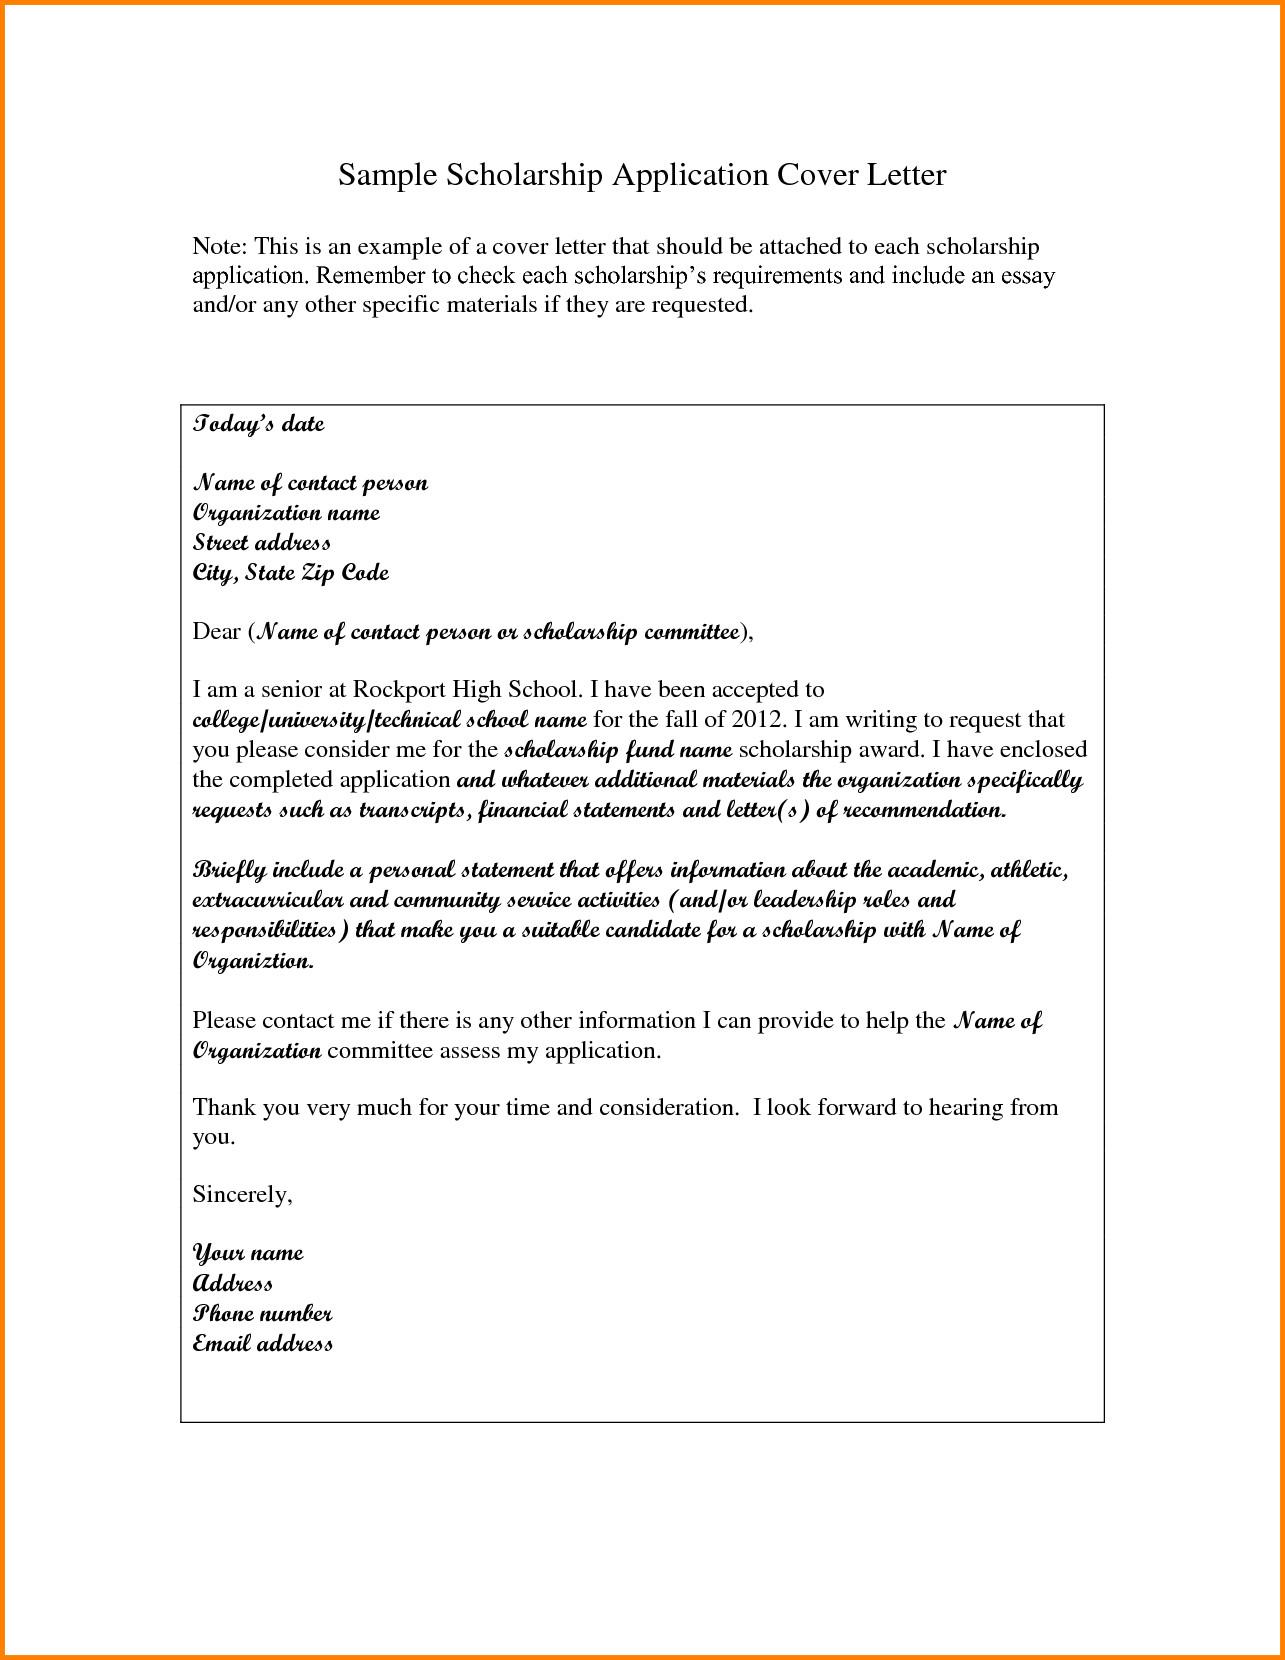 Scholarship Cover Letter Sample 7 Example Of Letter Of Application for Scholarship